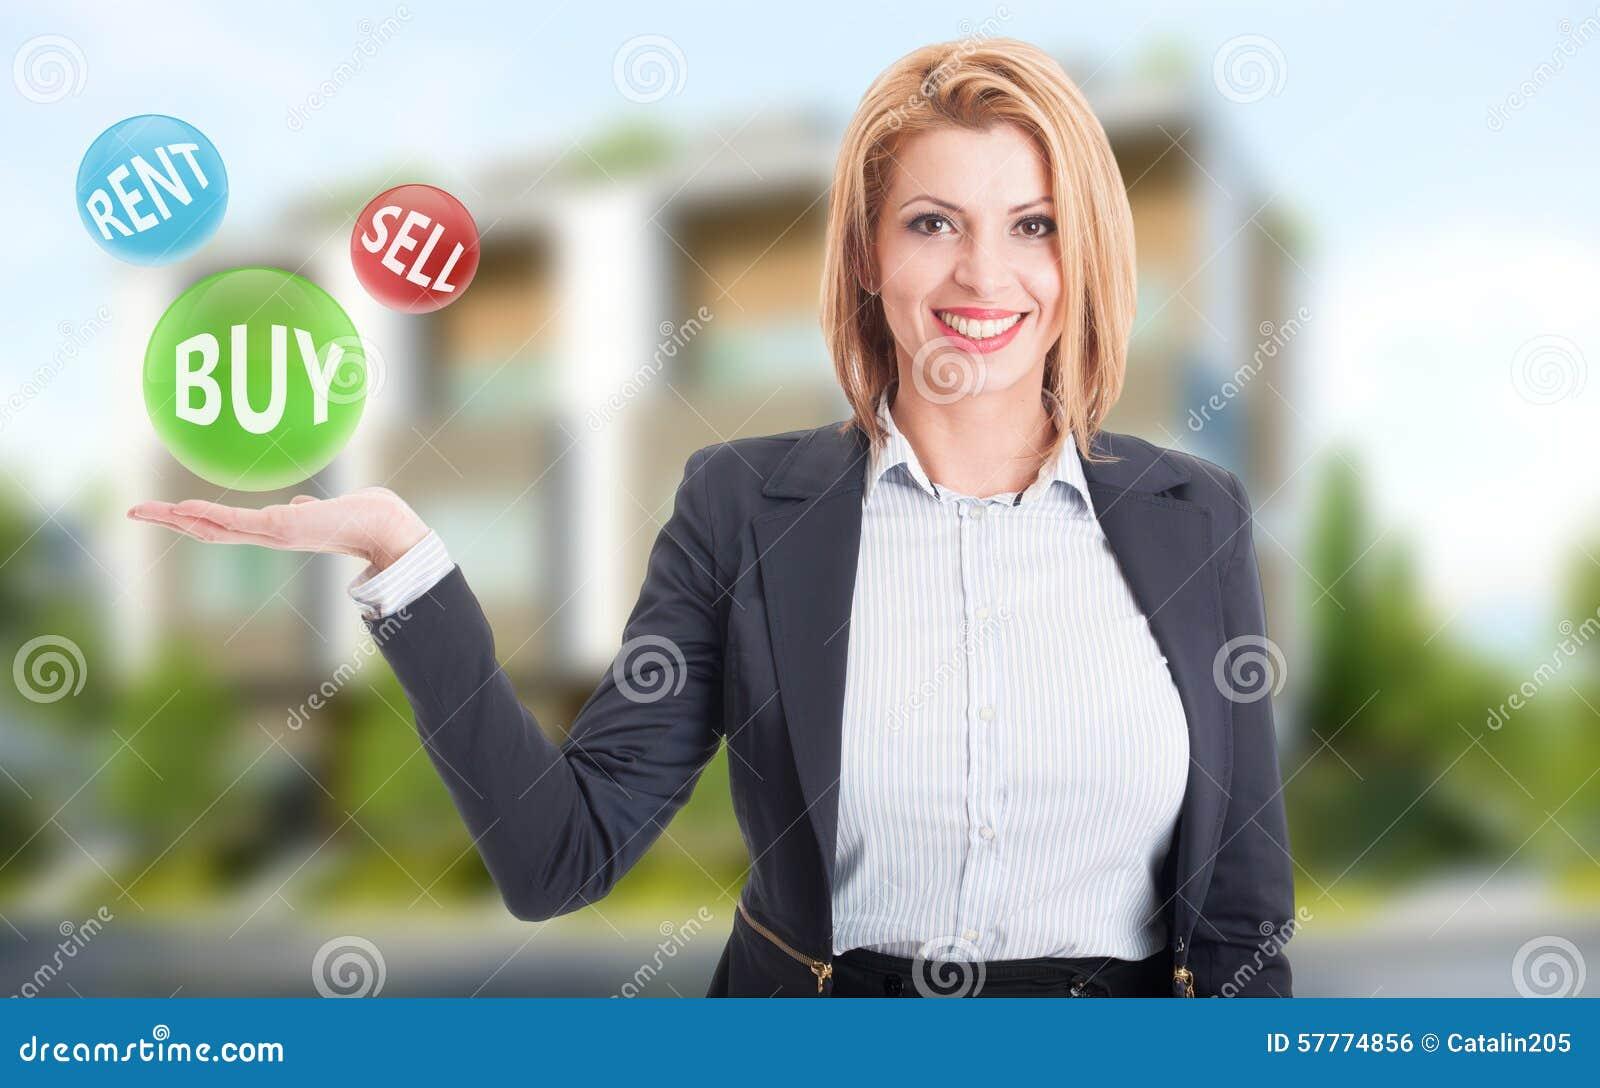 buy a woman - 2